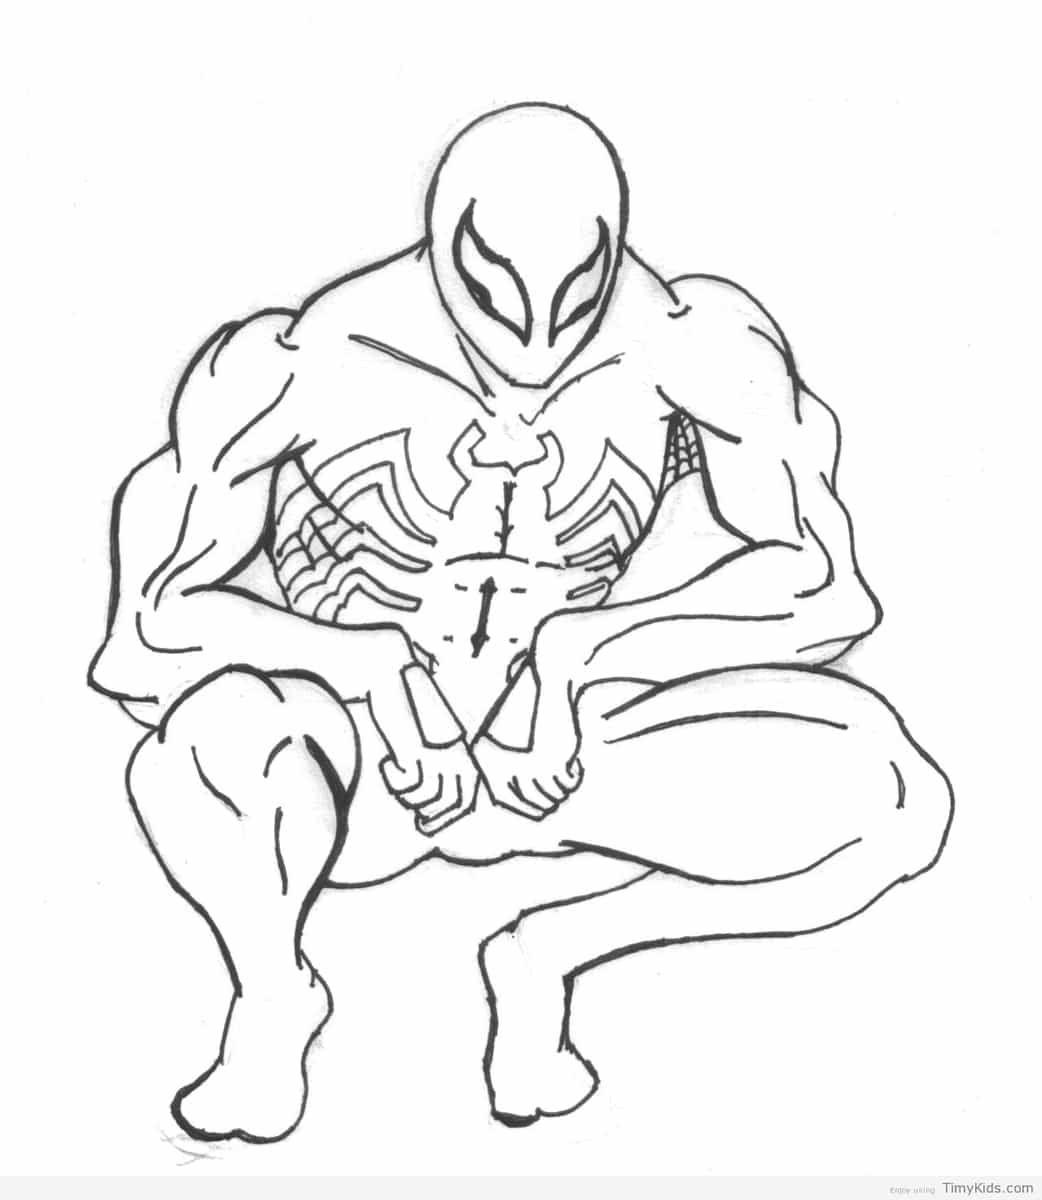 Http timykids com black suit spiderman coloring